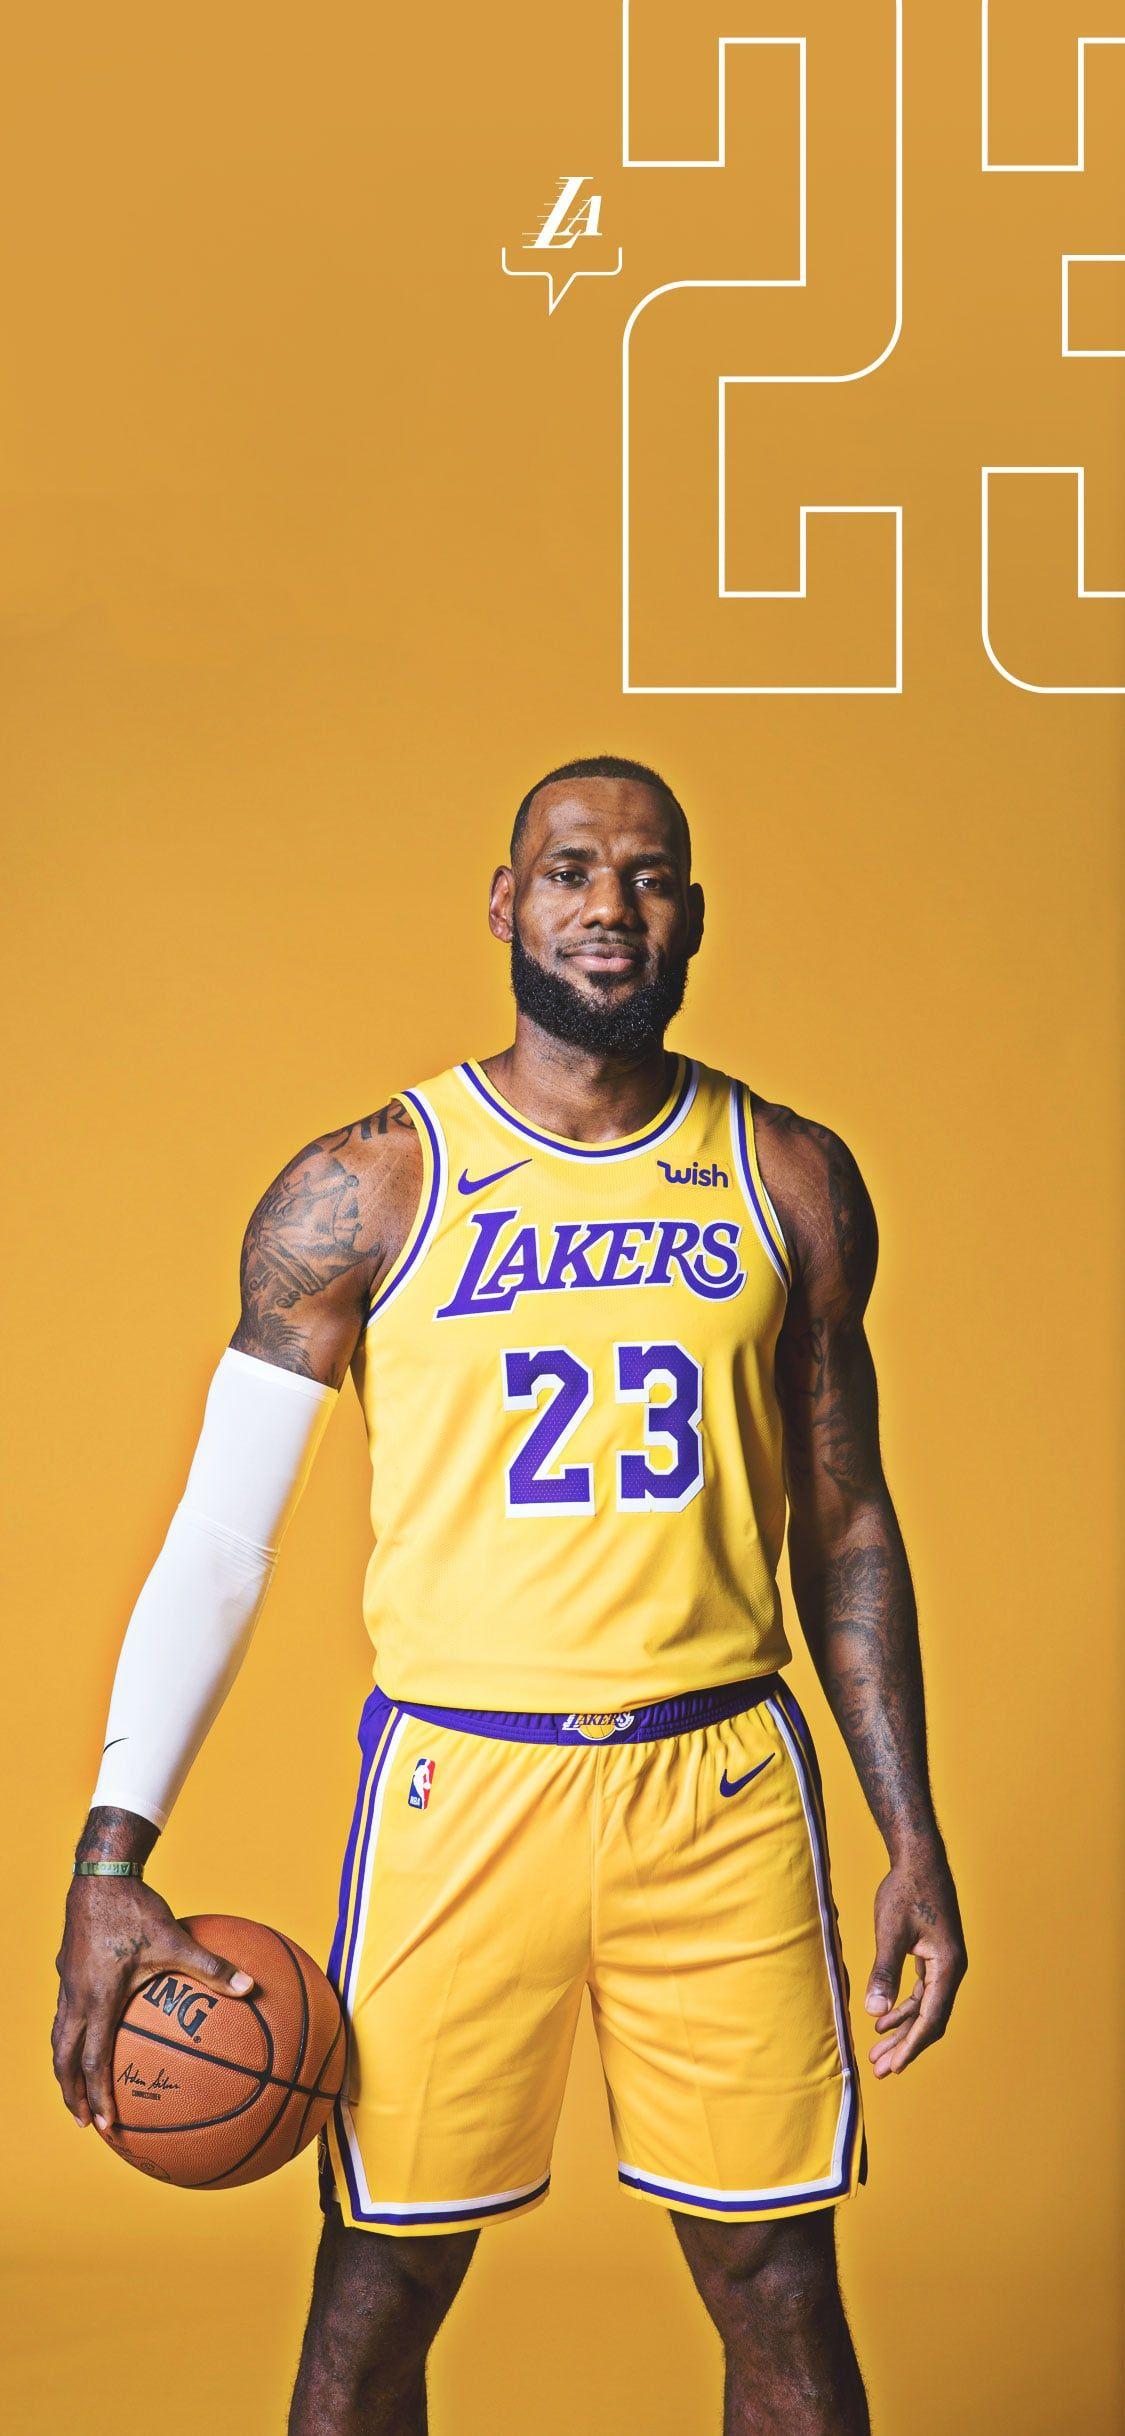 Lebron James Wallpaper Lakers , HD Wallpaper & Backgrounds